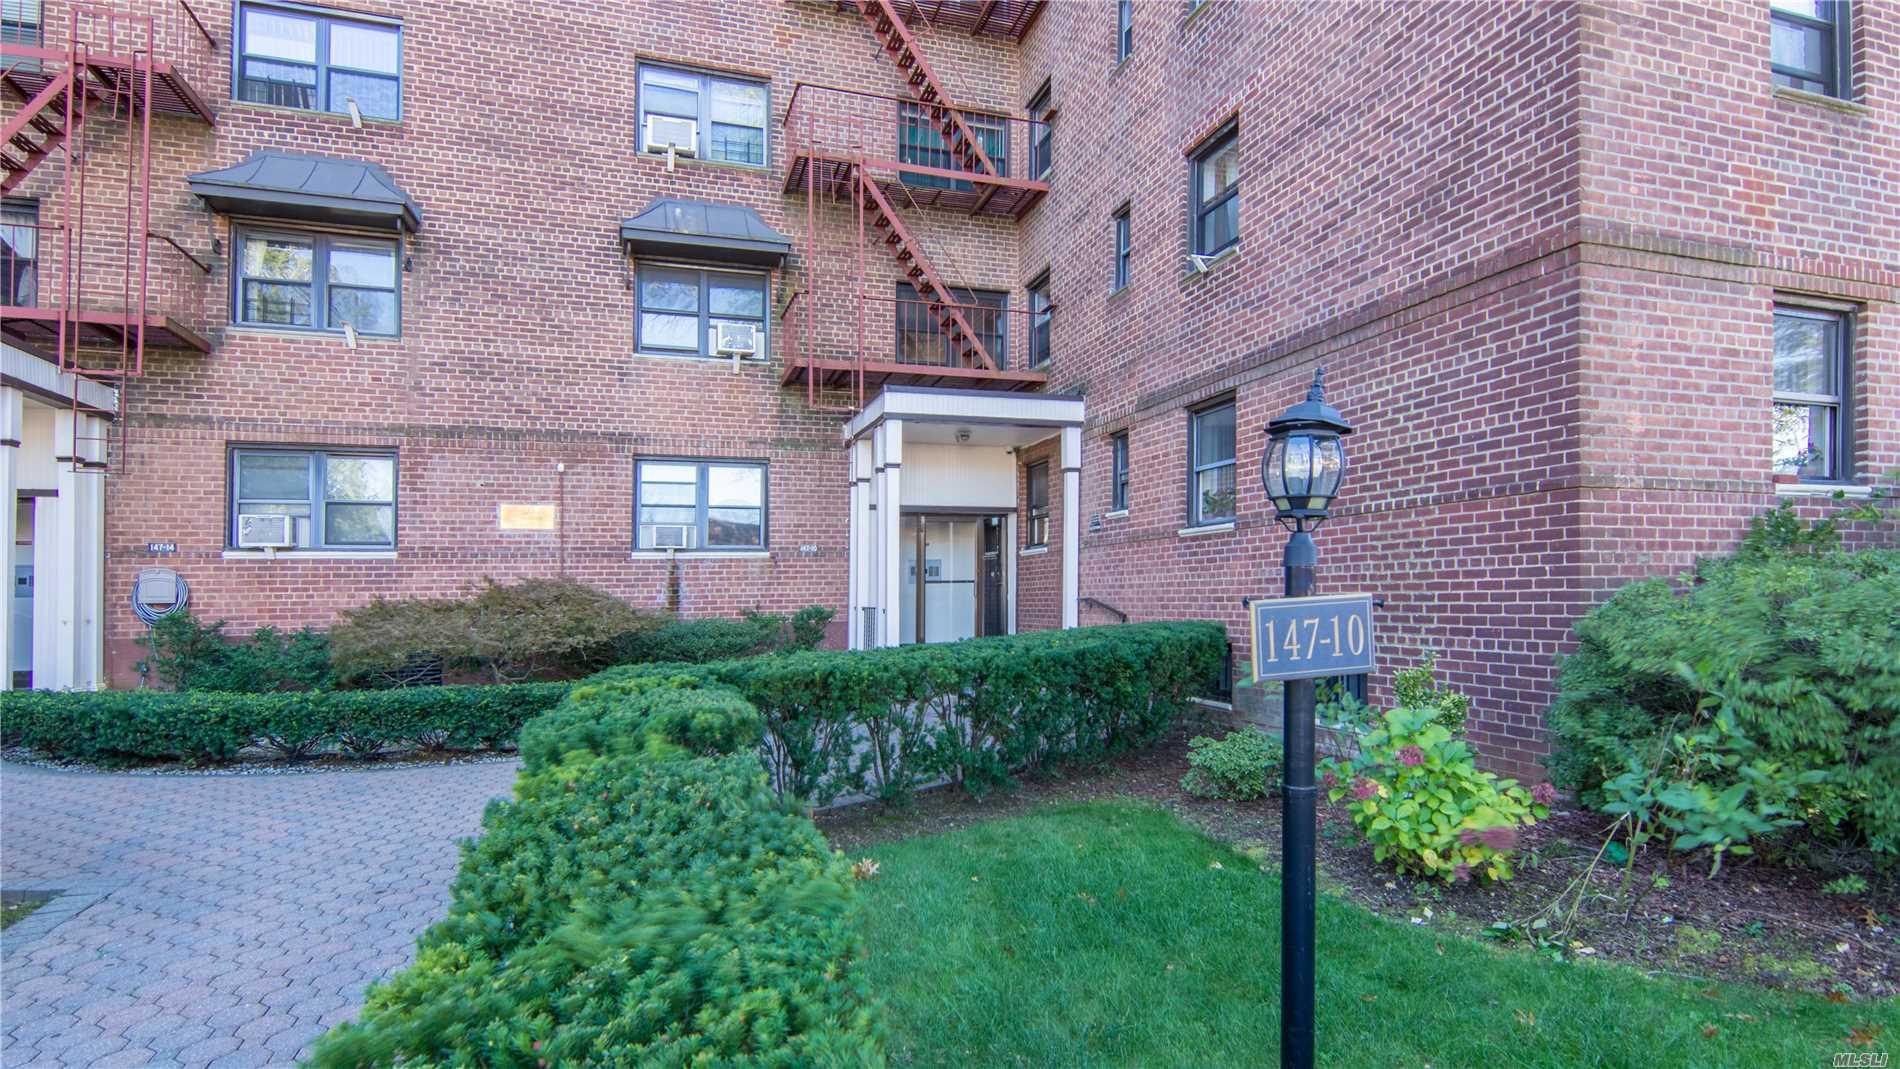 147-10 84 Rd, 4M - Briarwood, New York